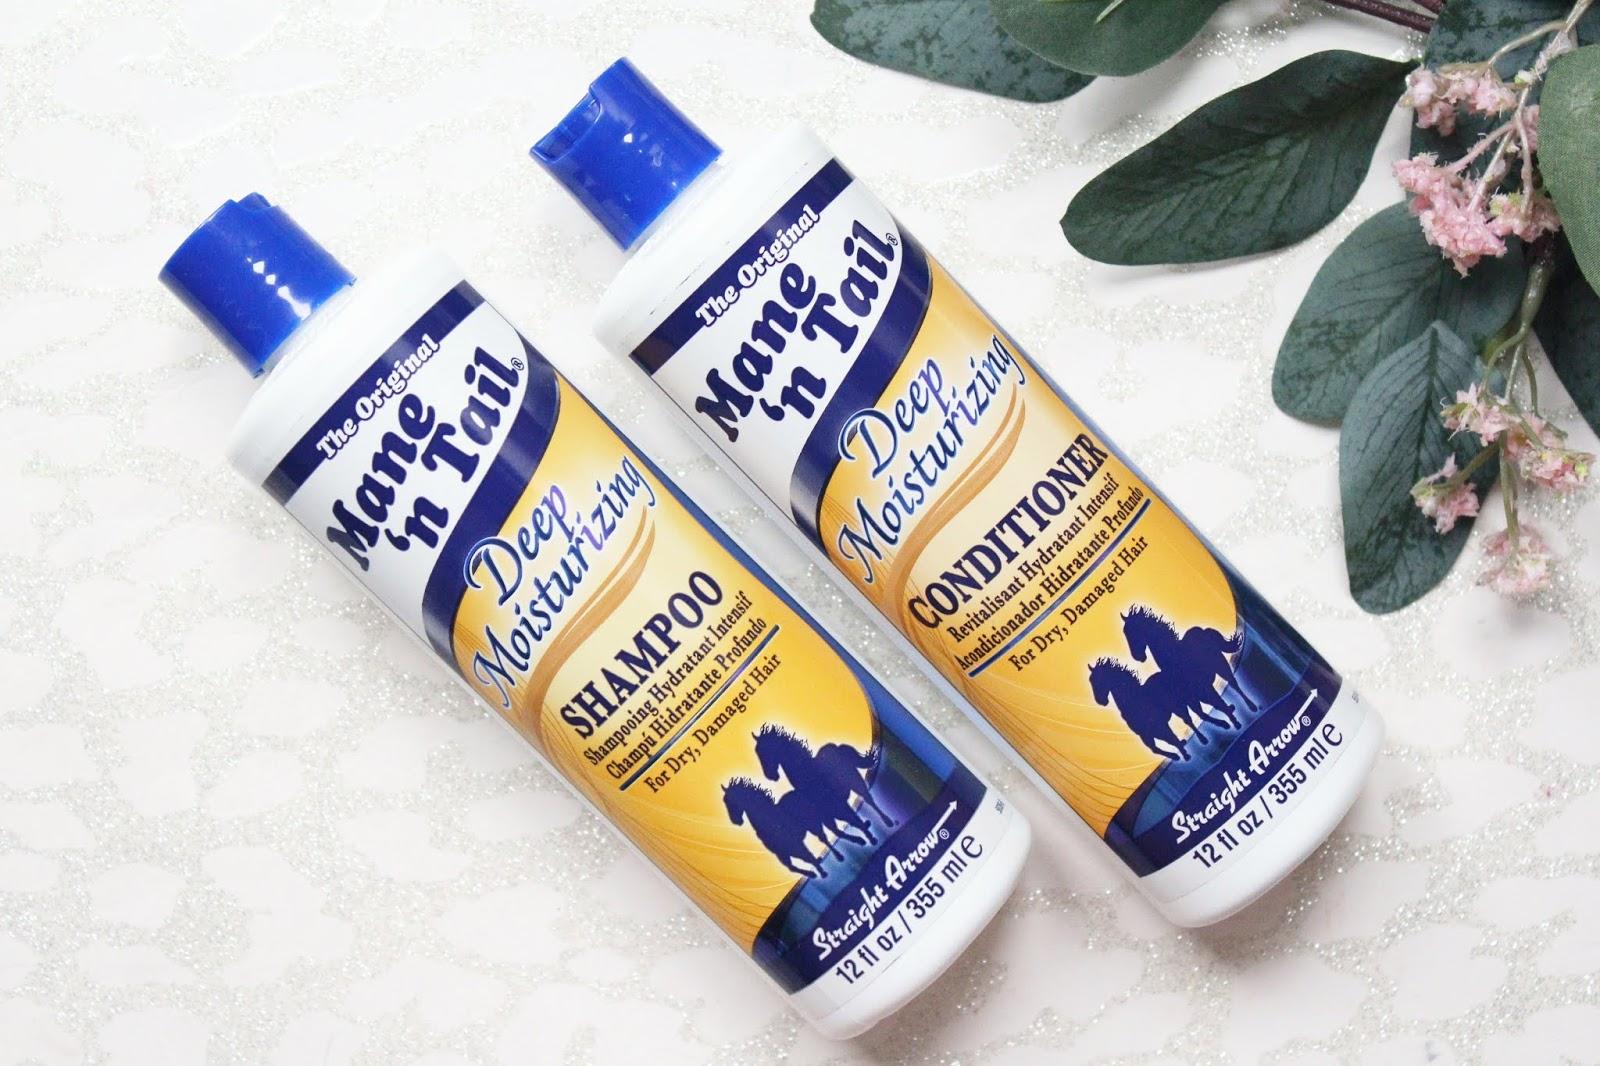 Mane 'n Tail Deep Moisturising Shampoo & Conditioner Review